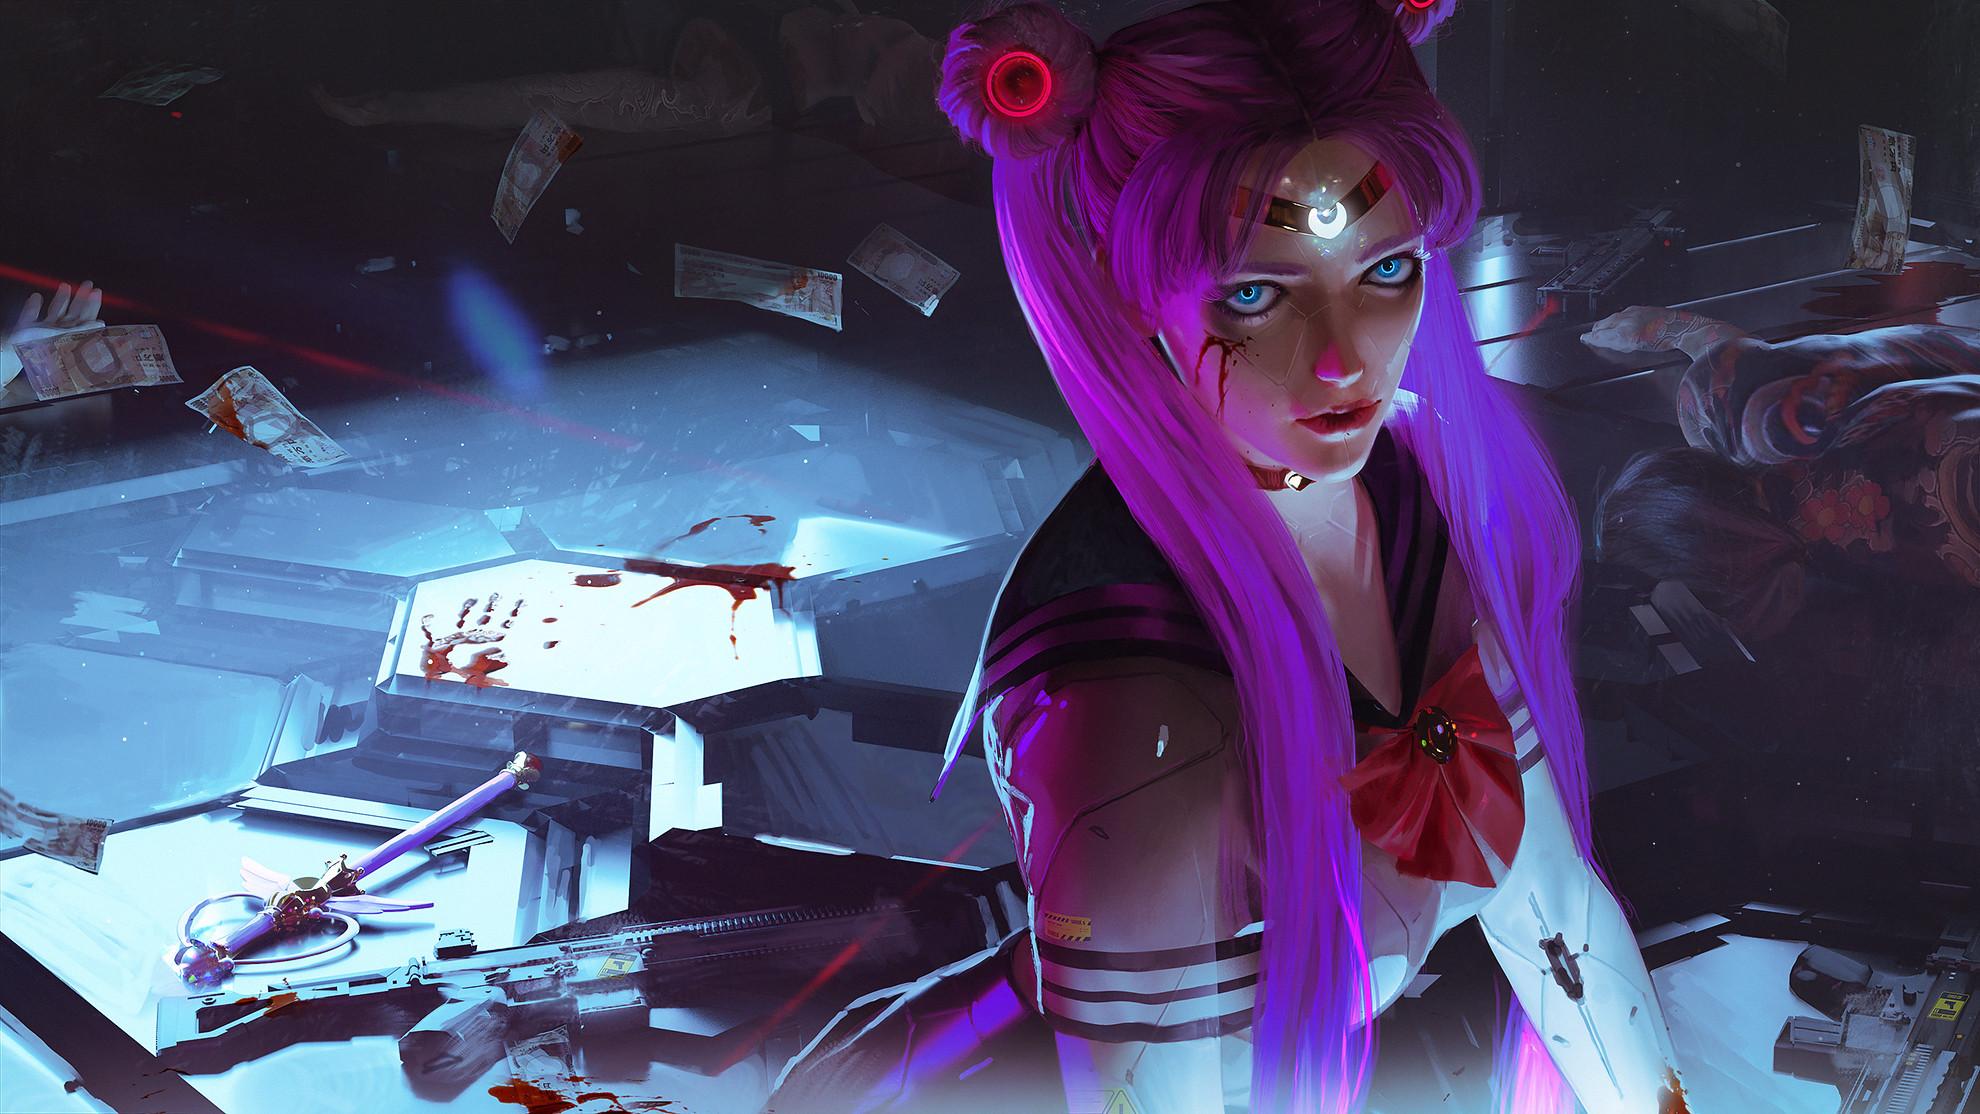 sailor moon cyberpunk 2077